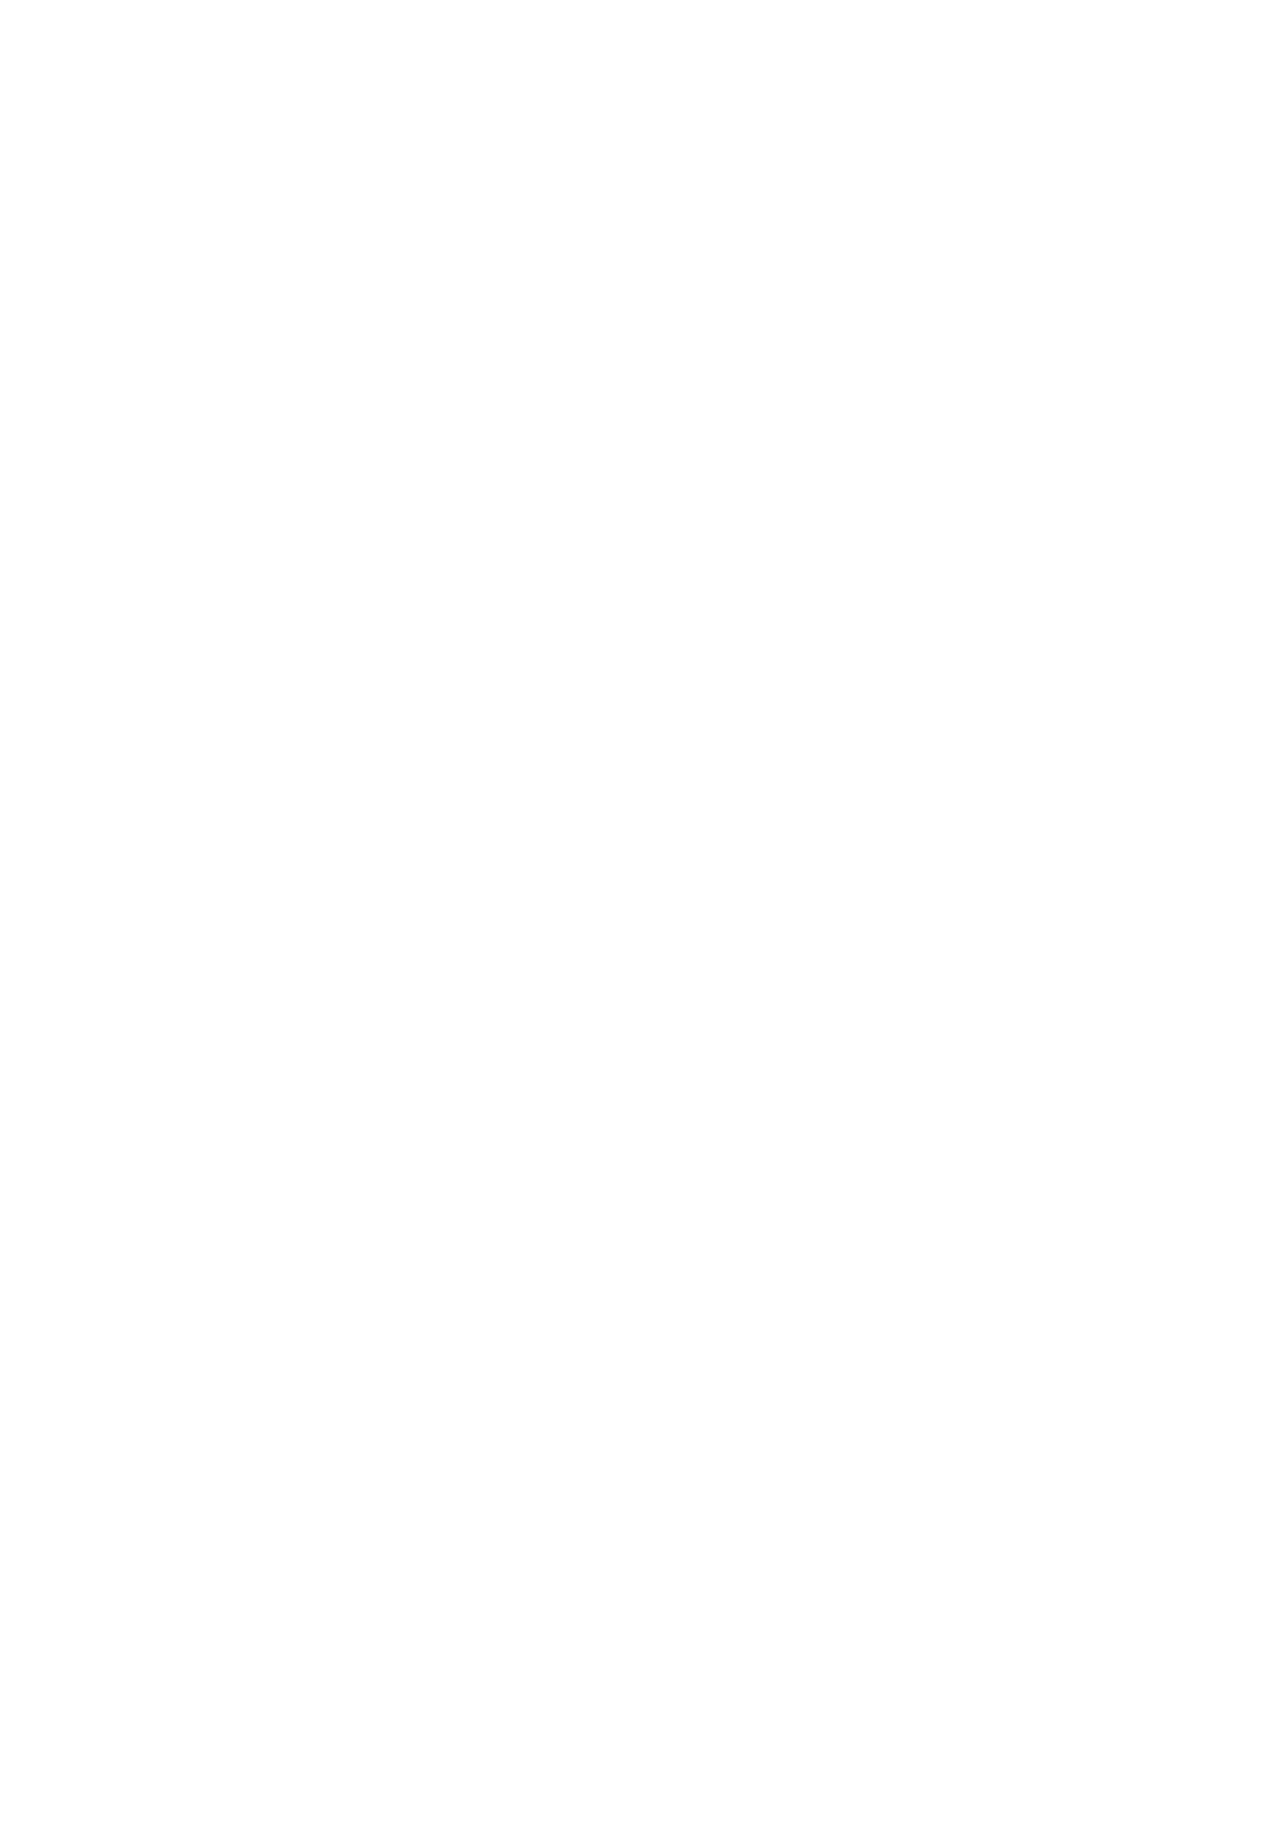 [Efuya (Messy)] Futanari Kanojo -Youshou Hen-   Futanari Girlfriend -Childhood Edition- [English] [q91] [Digital] 16